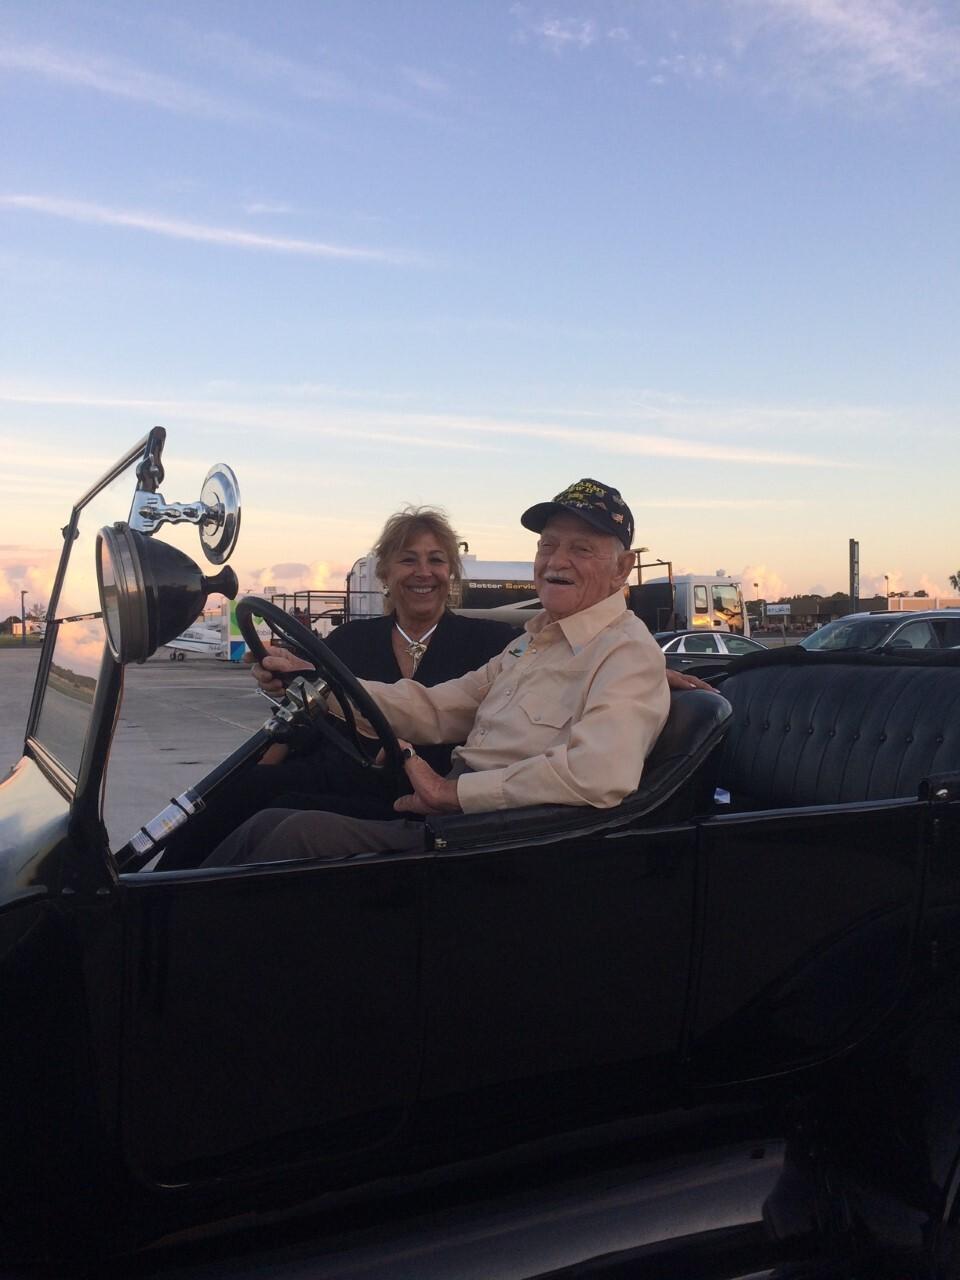 elderly man wearing white button up shirt riding a  black vintage convertible car.